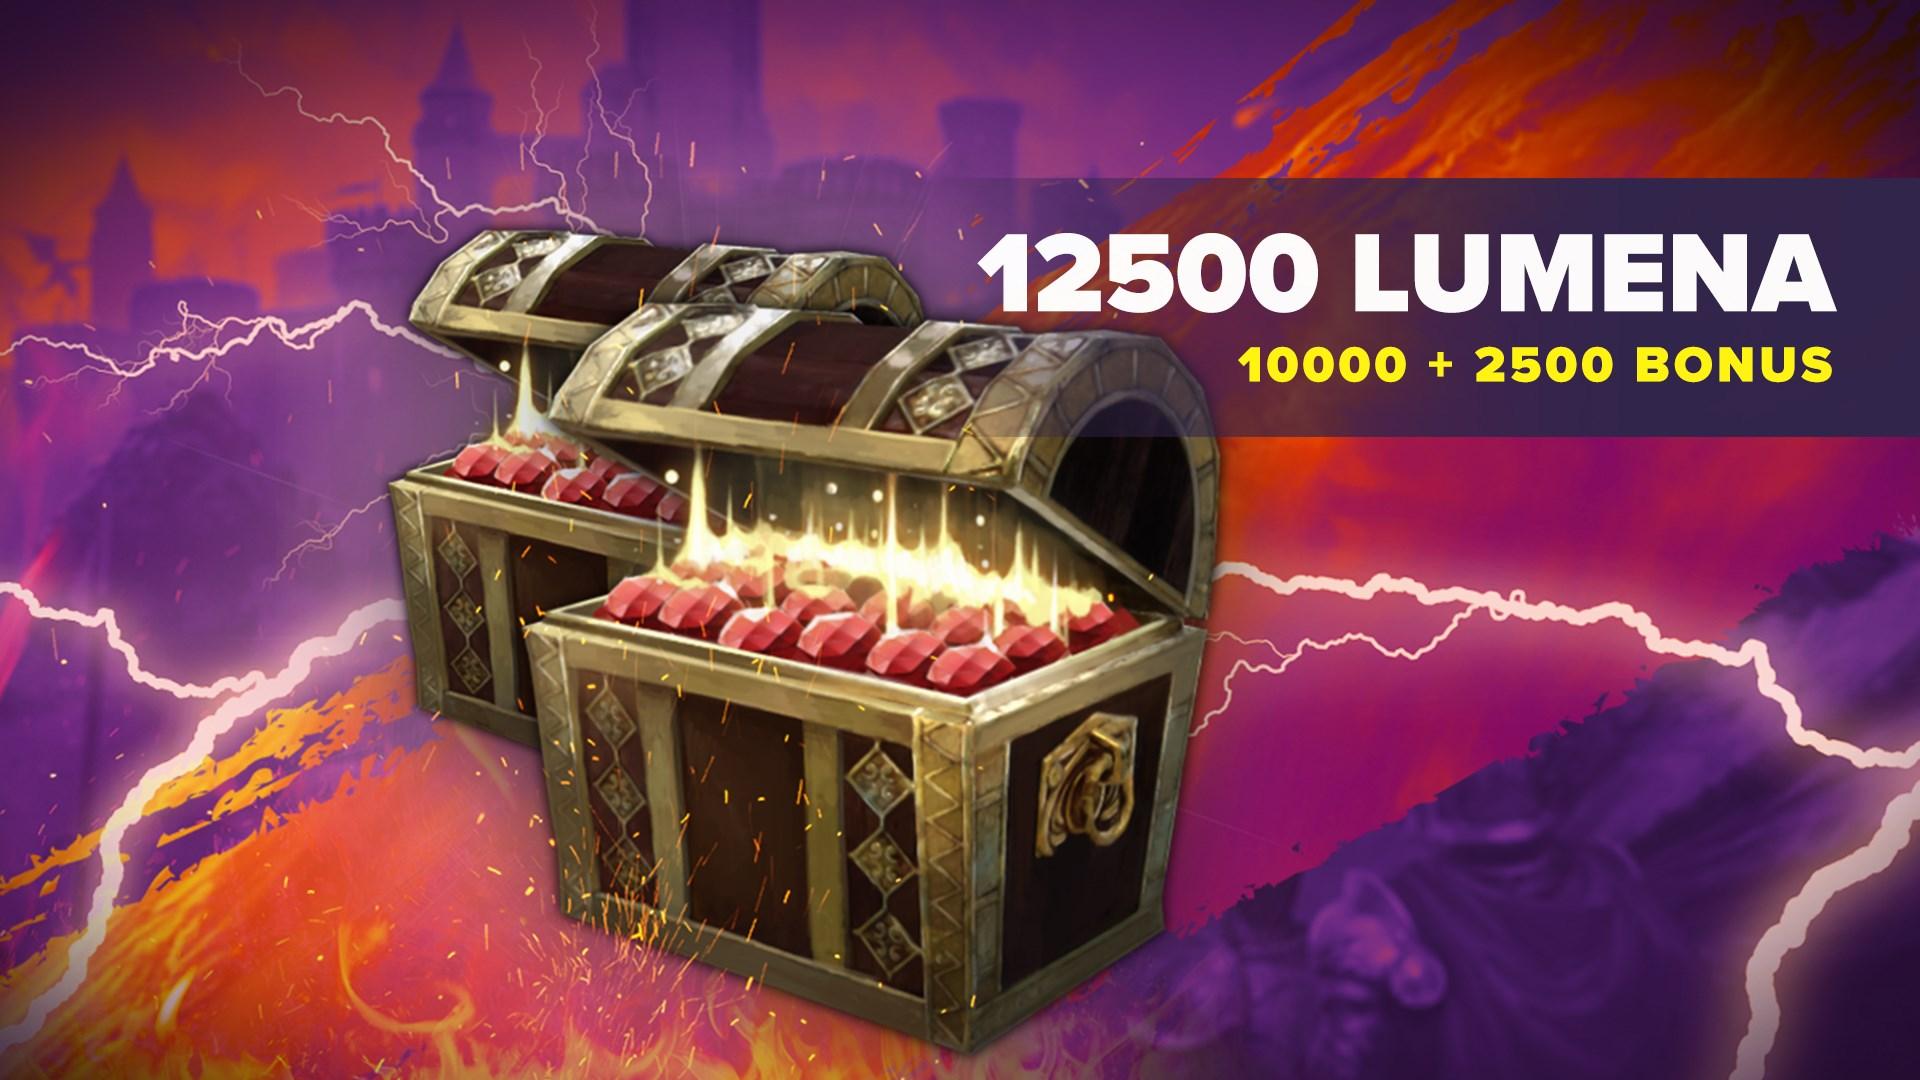 Bless Unleashed: 10,000 Lumena + 25% (2,500) Bonus